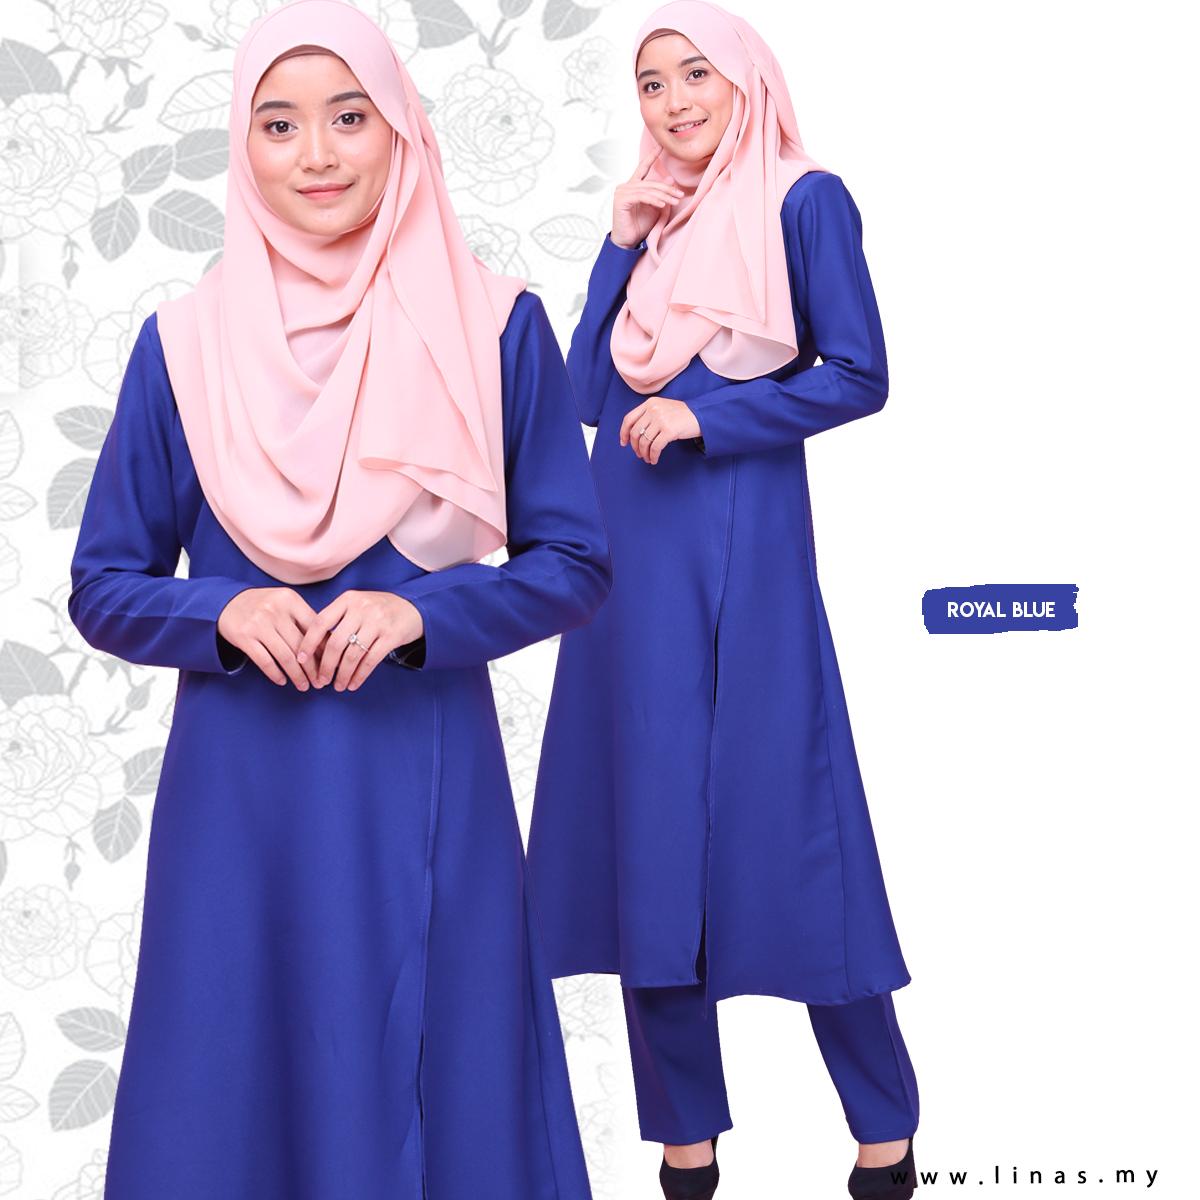 Long Suit SOFEA for Office Wear / Casual Wear / Seluar Muslimah / Umrah / Set Baju Seluar / Set Warda / Gamis